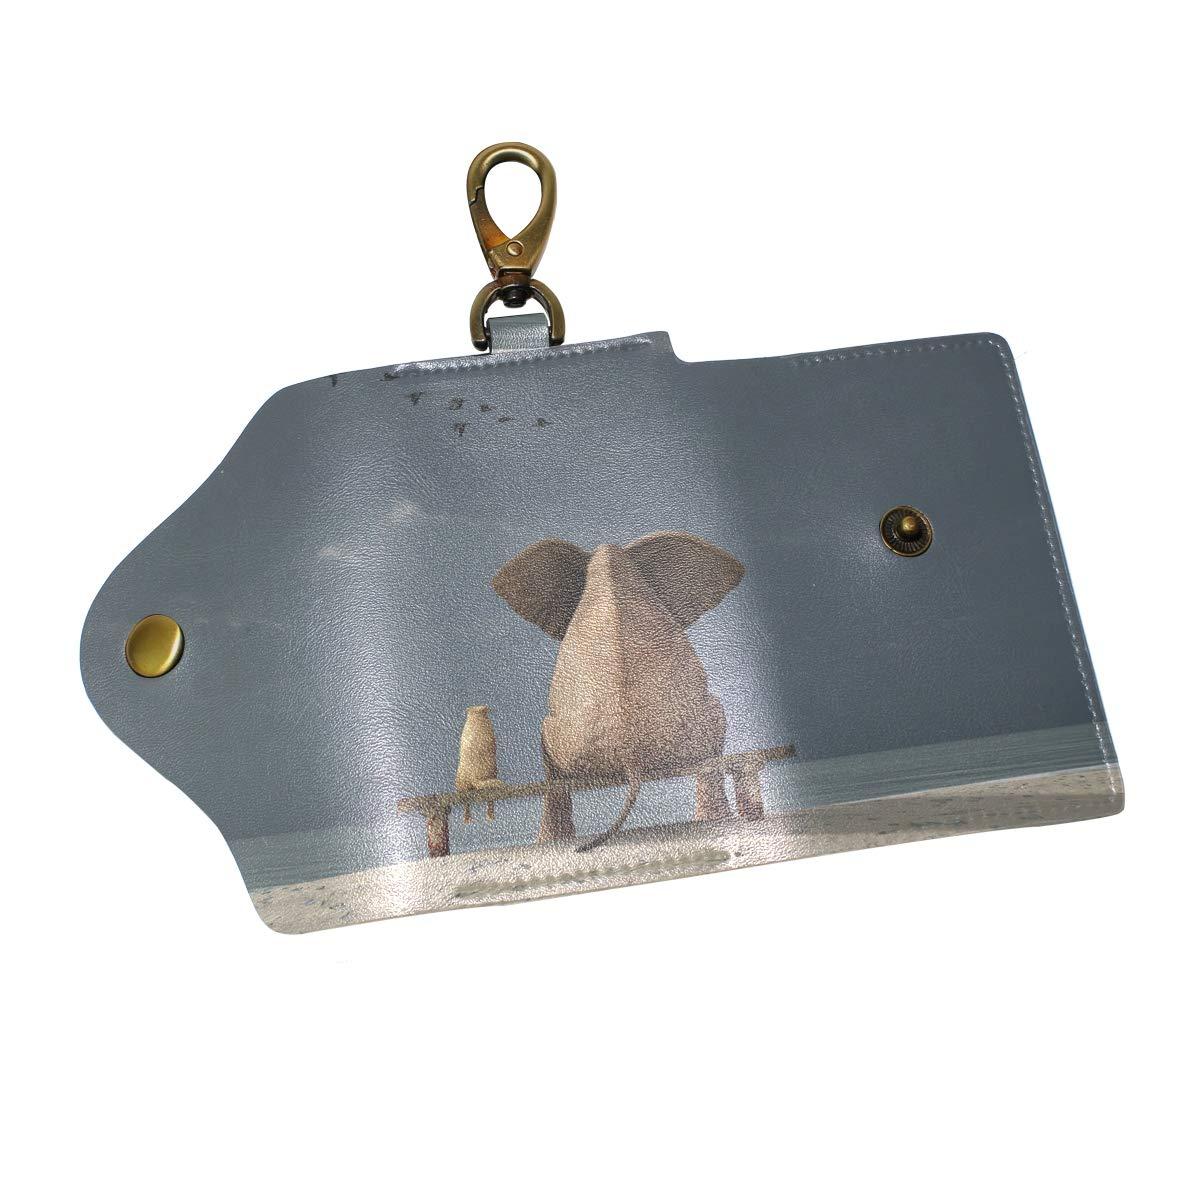 KEAKIA Elephant Leather Key Case Wallets Tri-fold Key Holder Keychains with 6 Hooks 2 Slot Snap Closure for Men Women